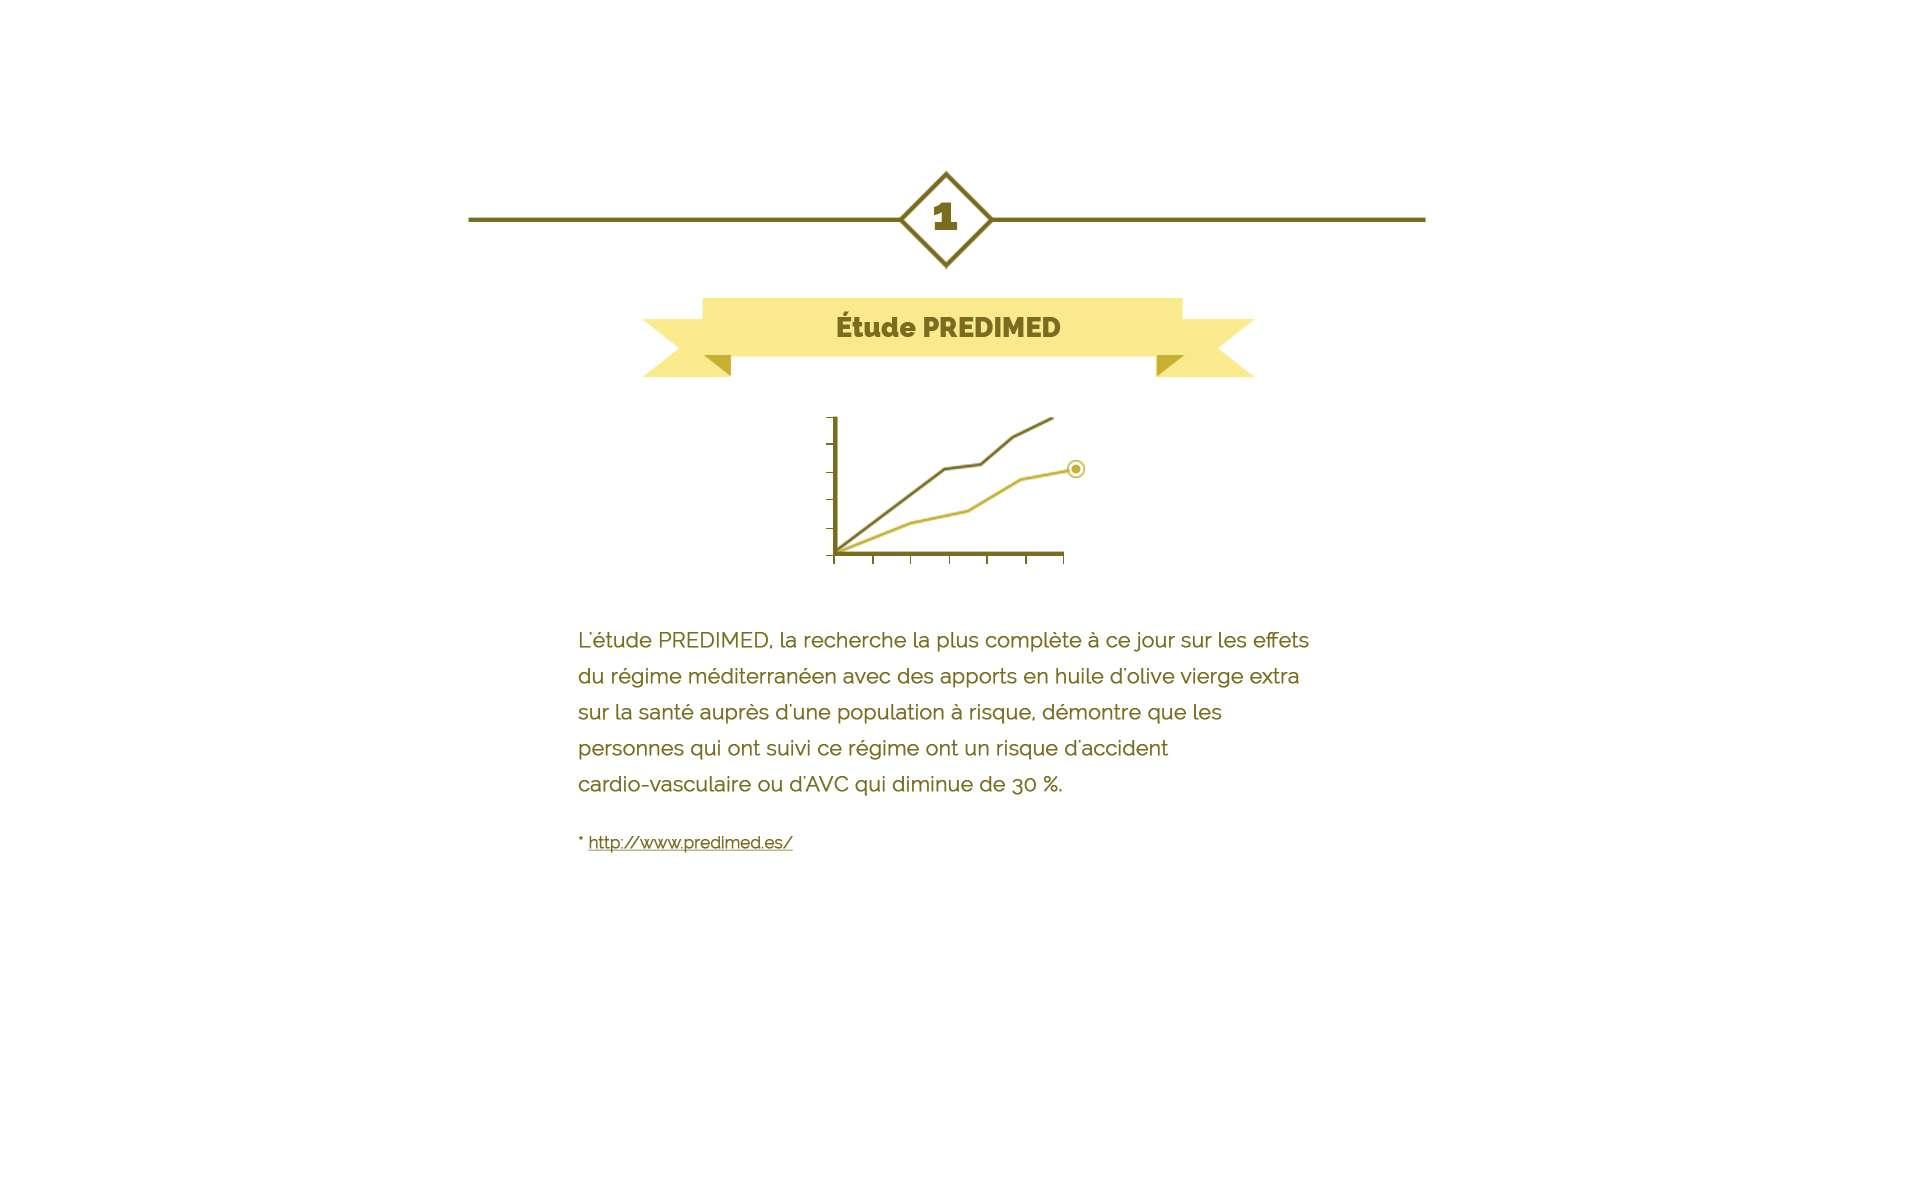 Etude Predimed sur l'huile d'olive